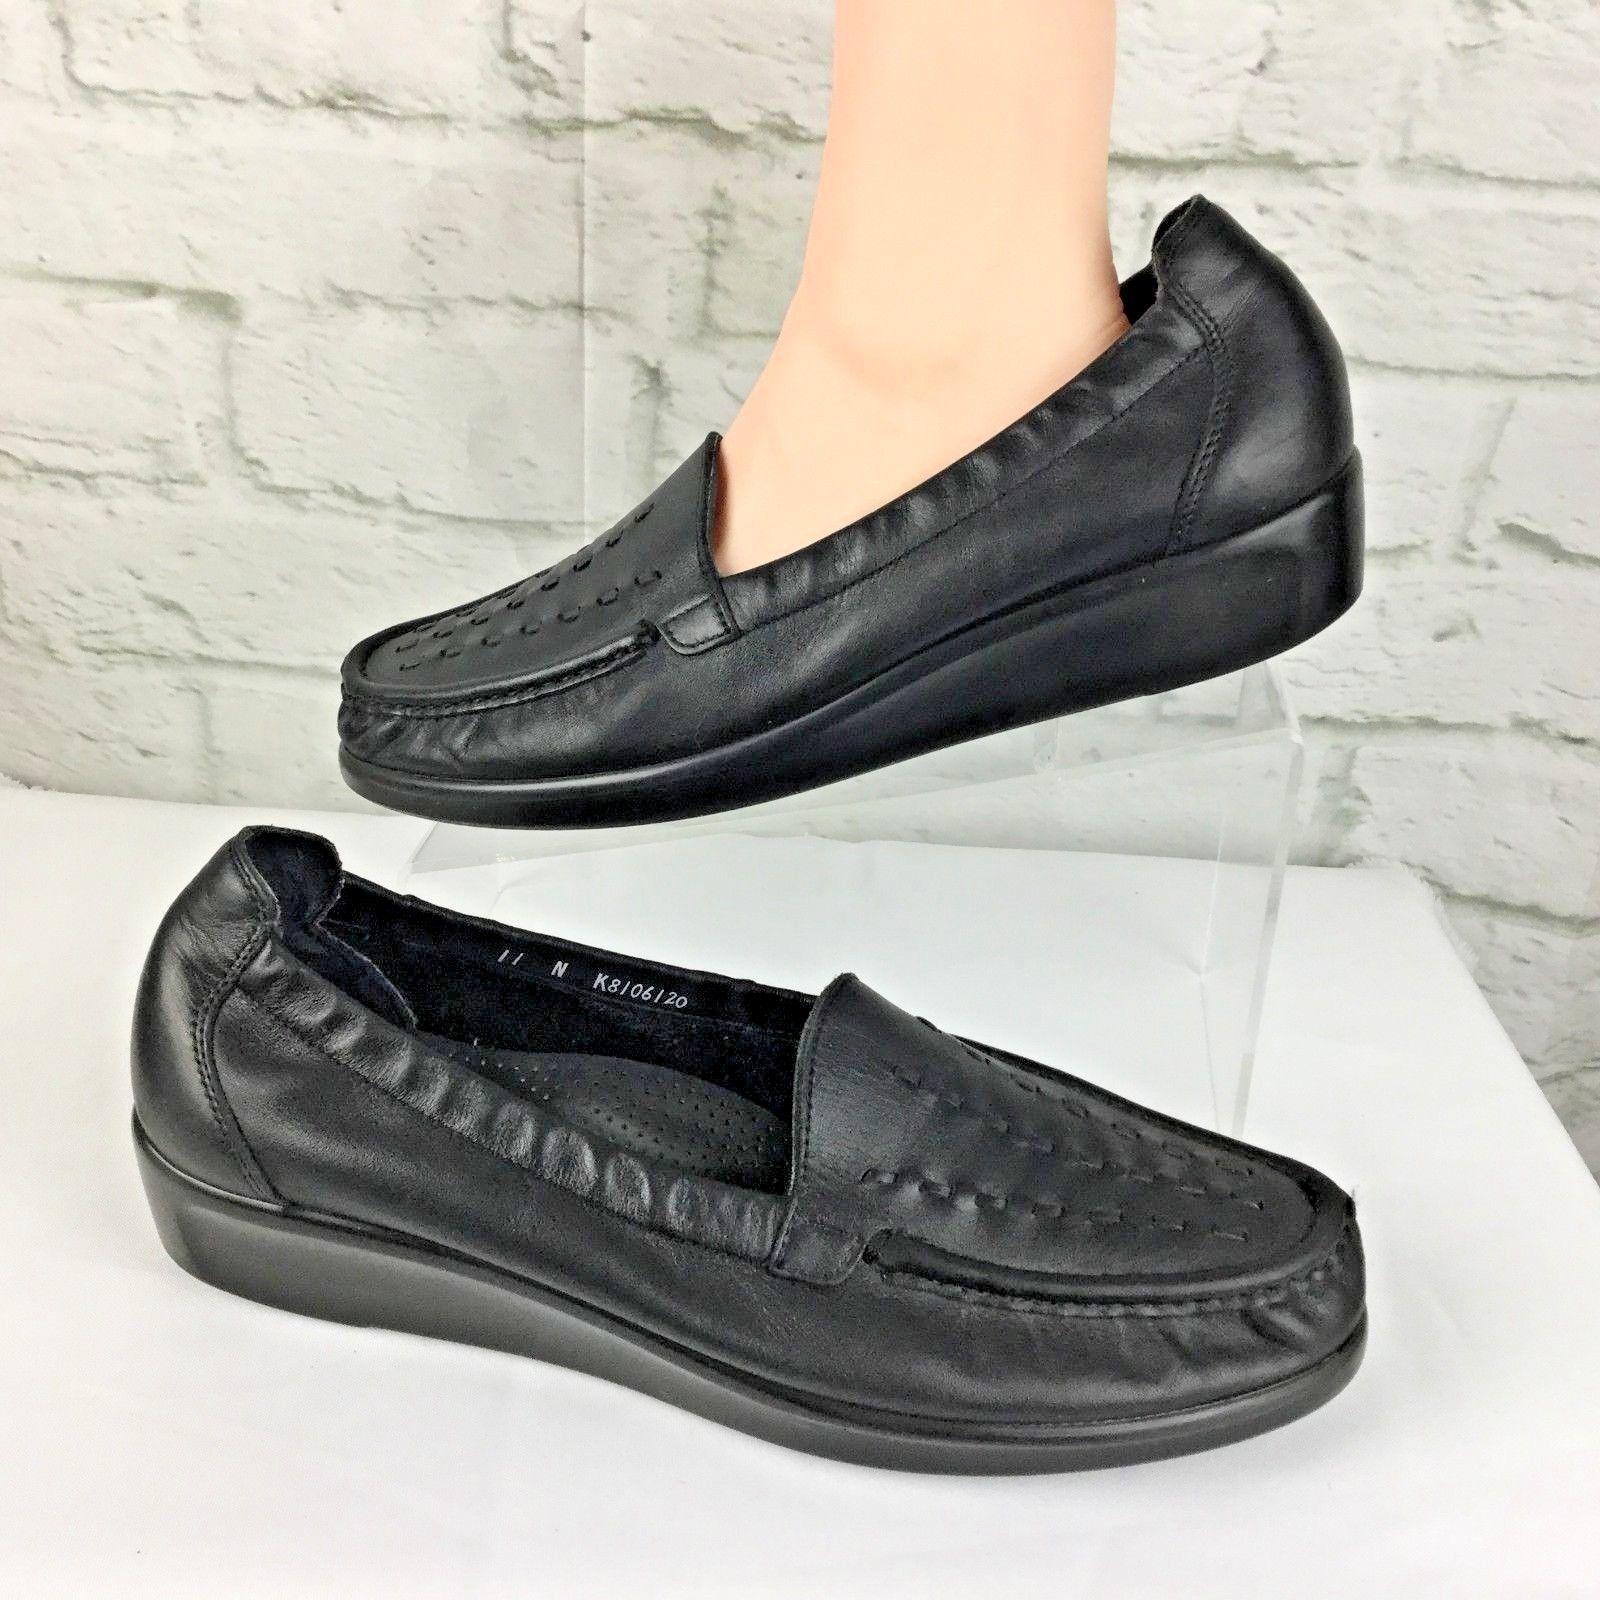 9a9d756fe9b SAS Black Tripad Comfort Slip On Loafers and 50 similar items